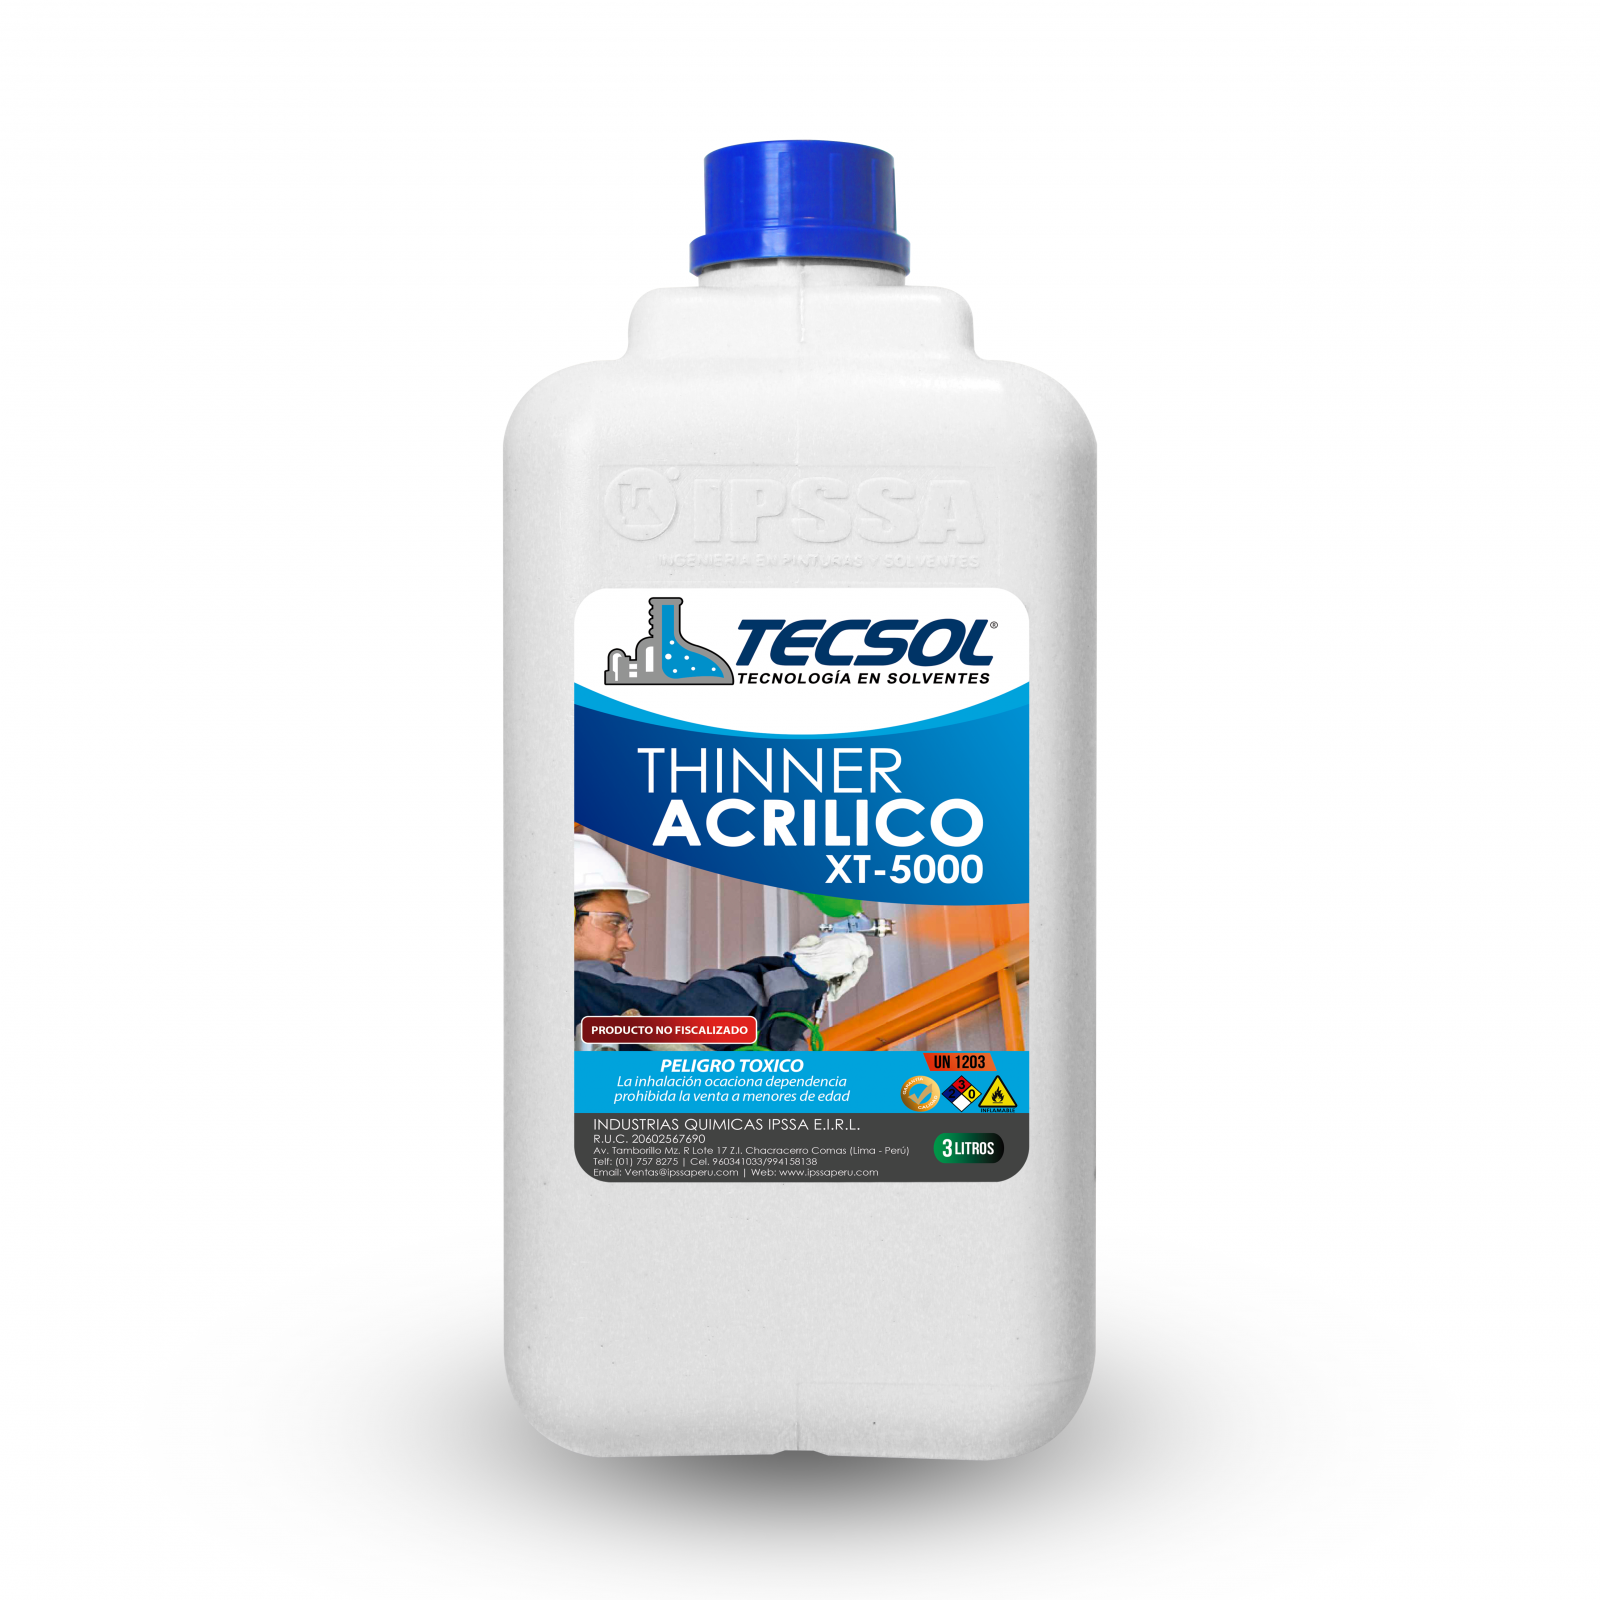 Thinner Acrilico XT-5000